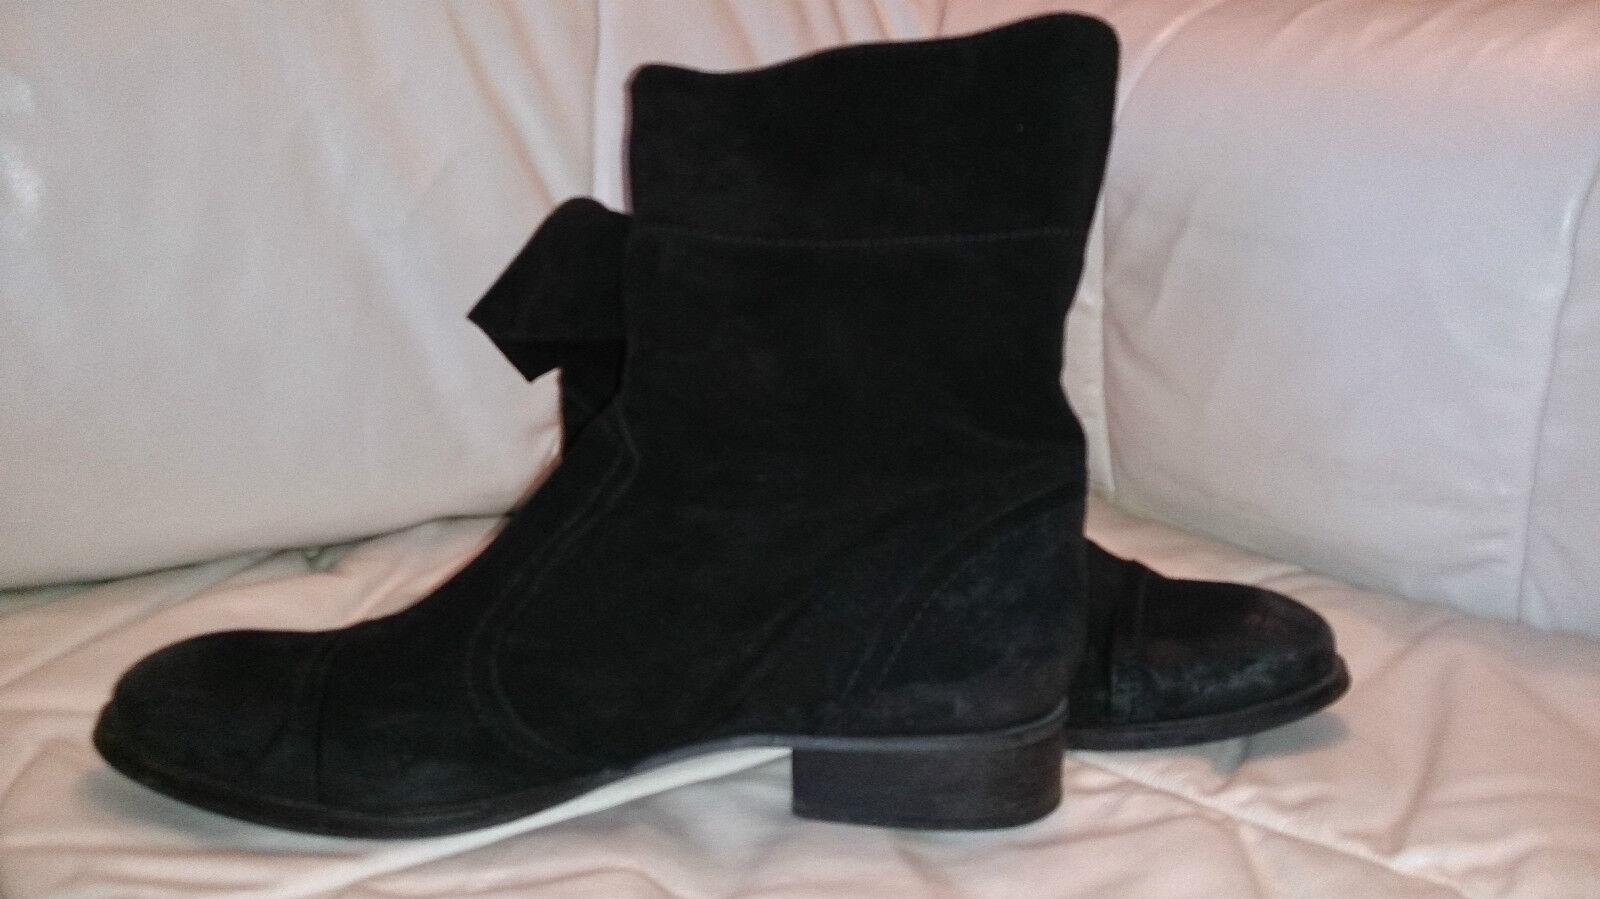 Sofie Gr.41 Schnoor Brushed suede boot/Stiefelette, Gr.41 Sofie 7b09ad